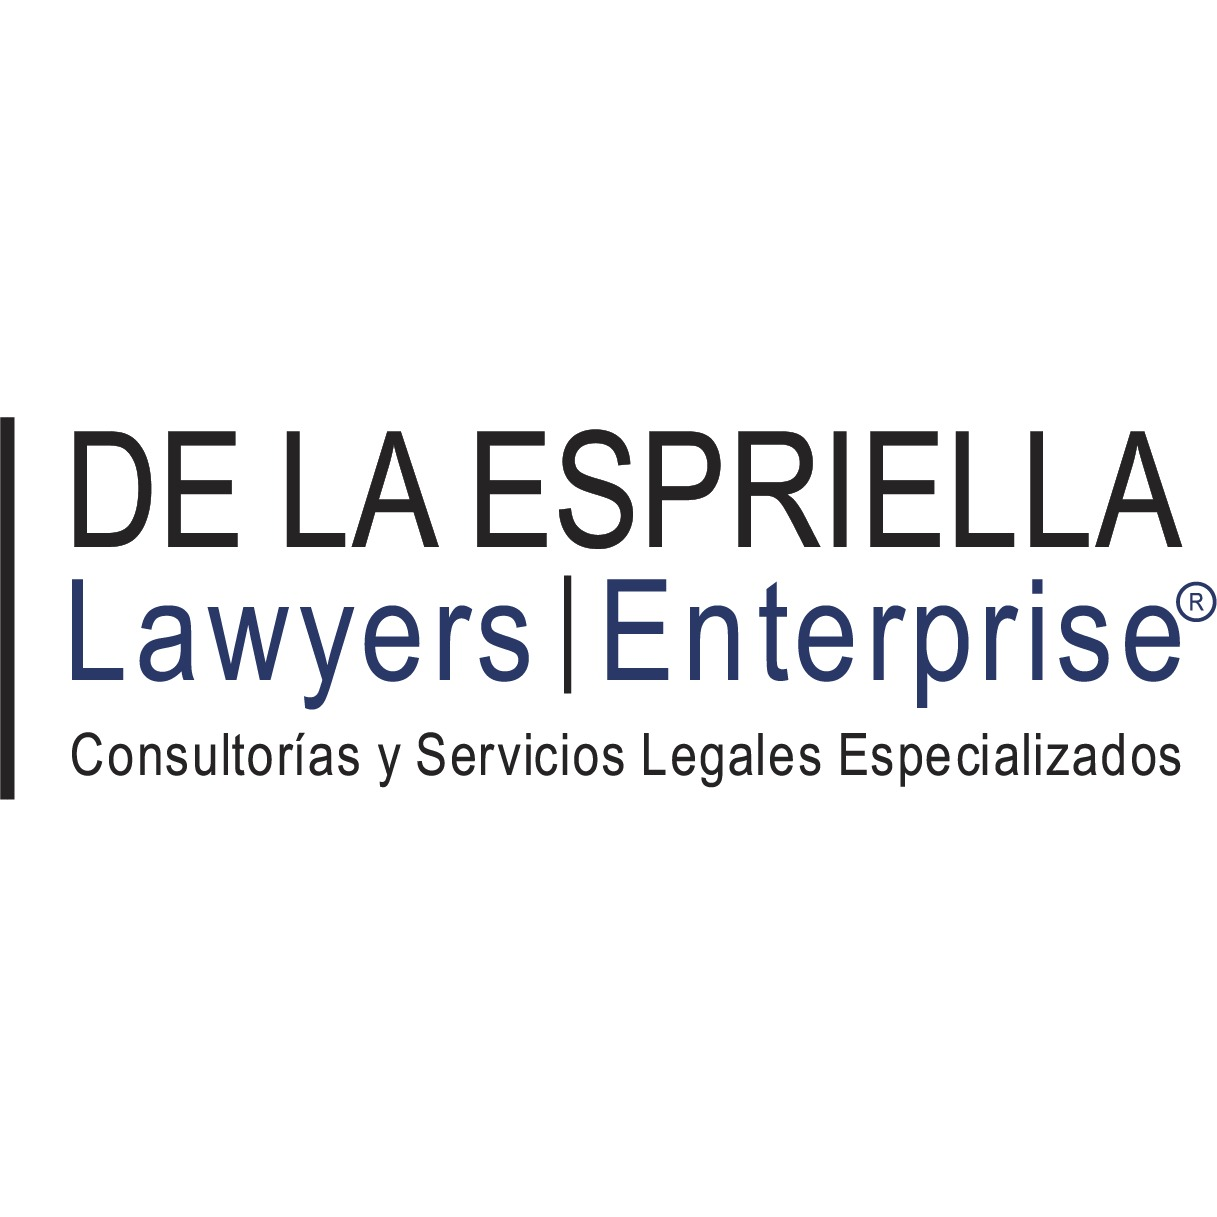 the De La Espriella Lawyers Enterprise logo.